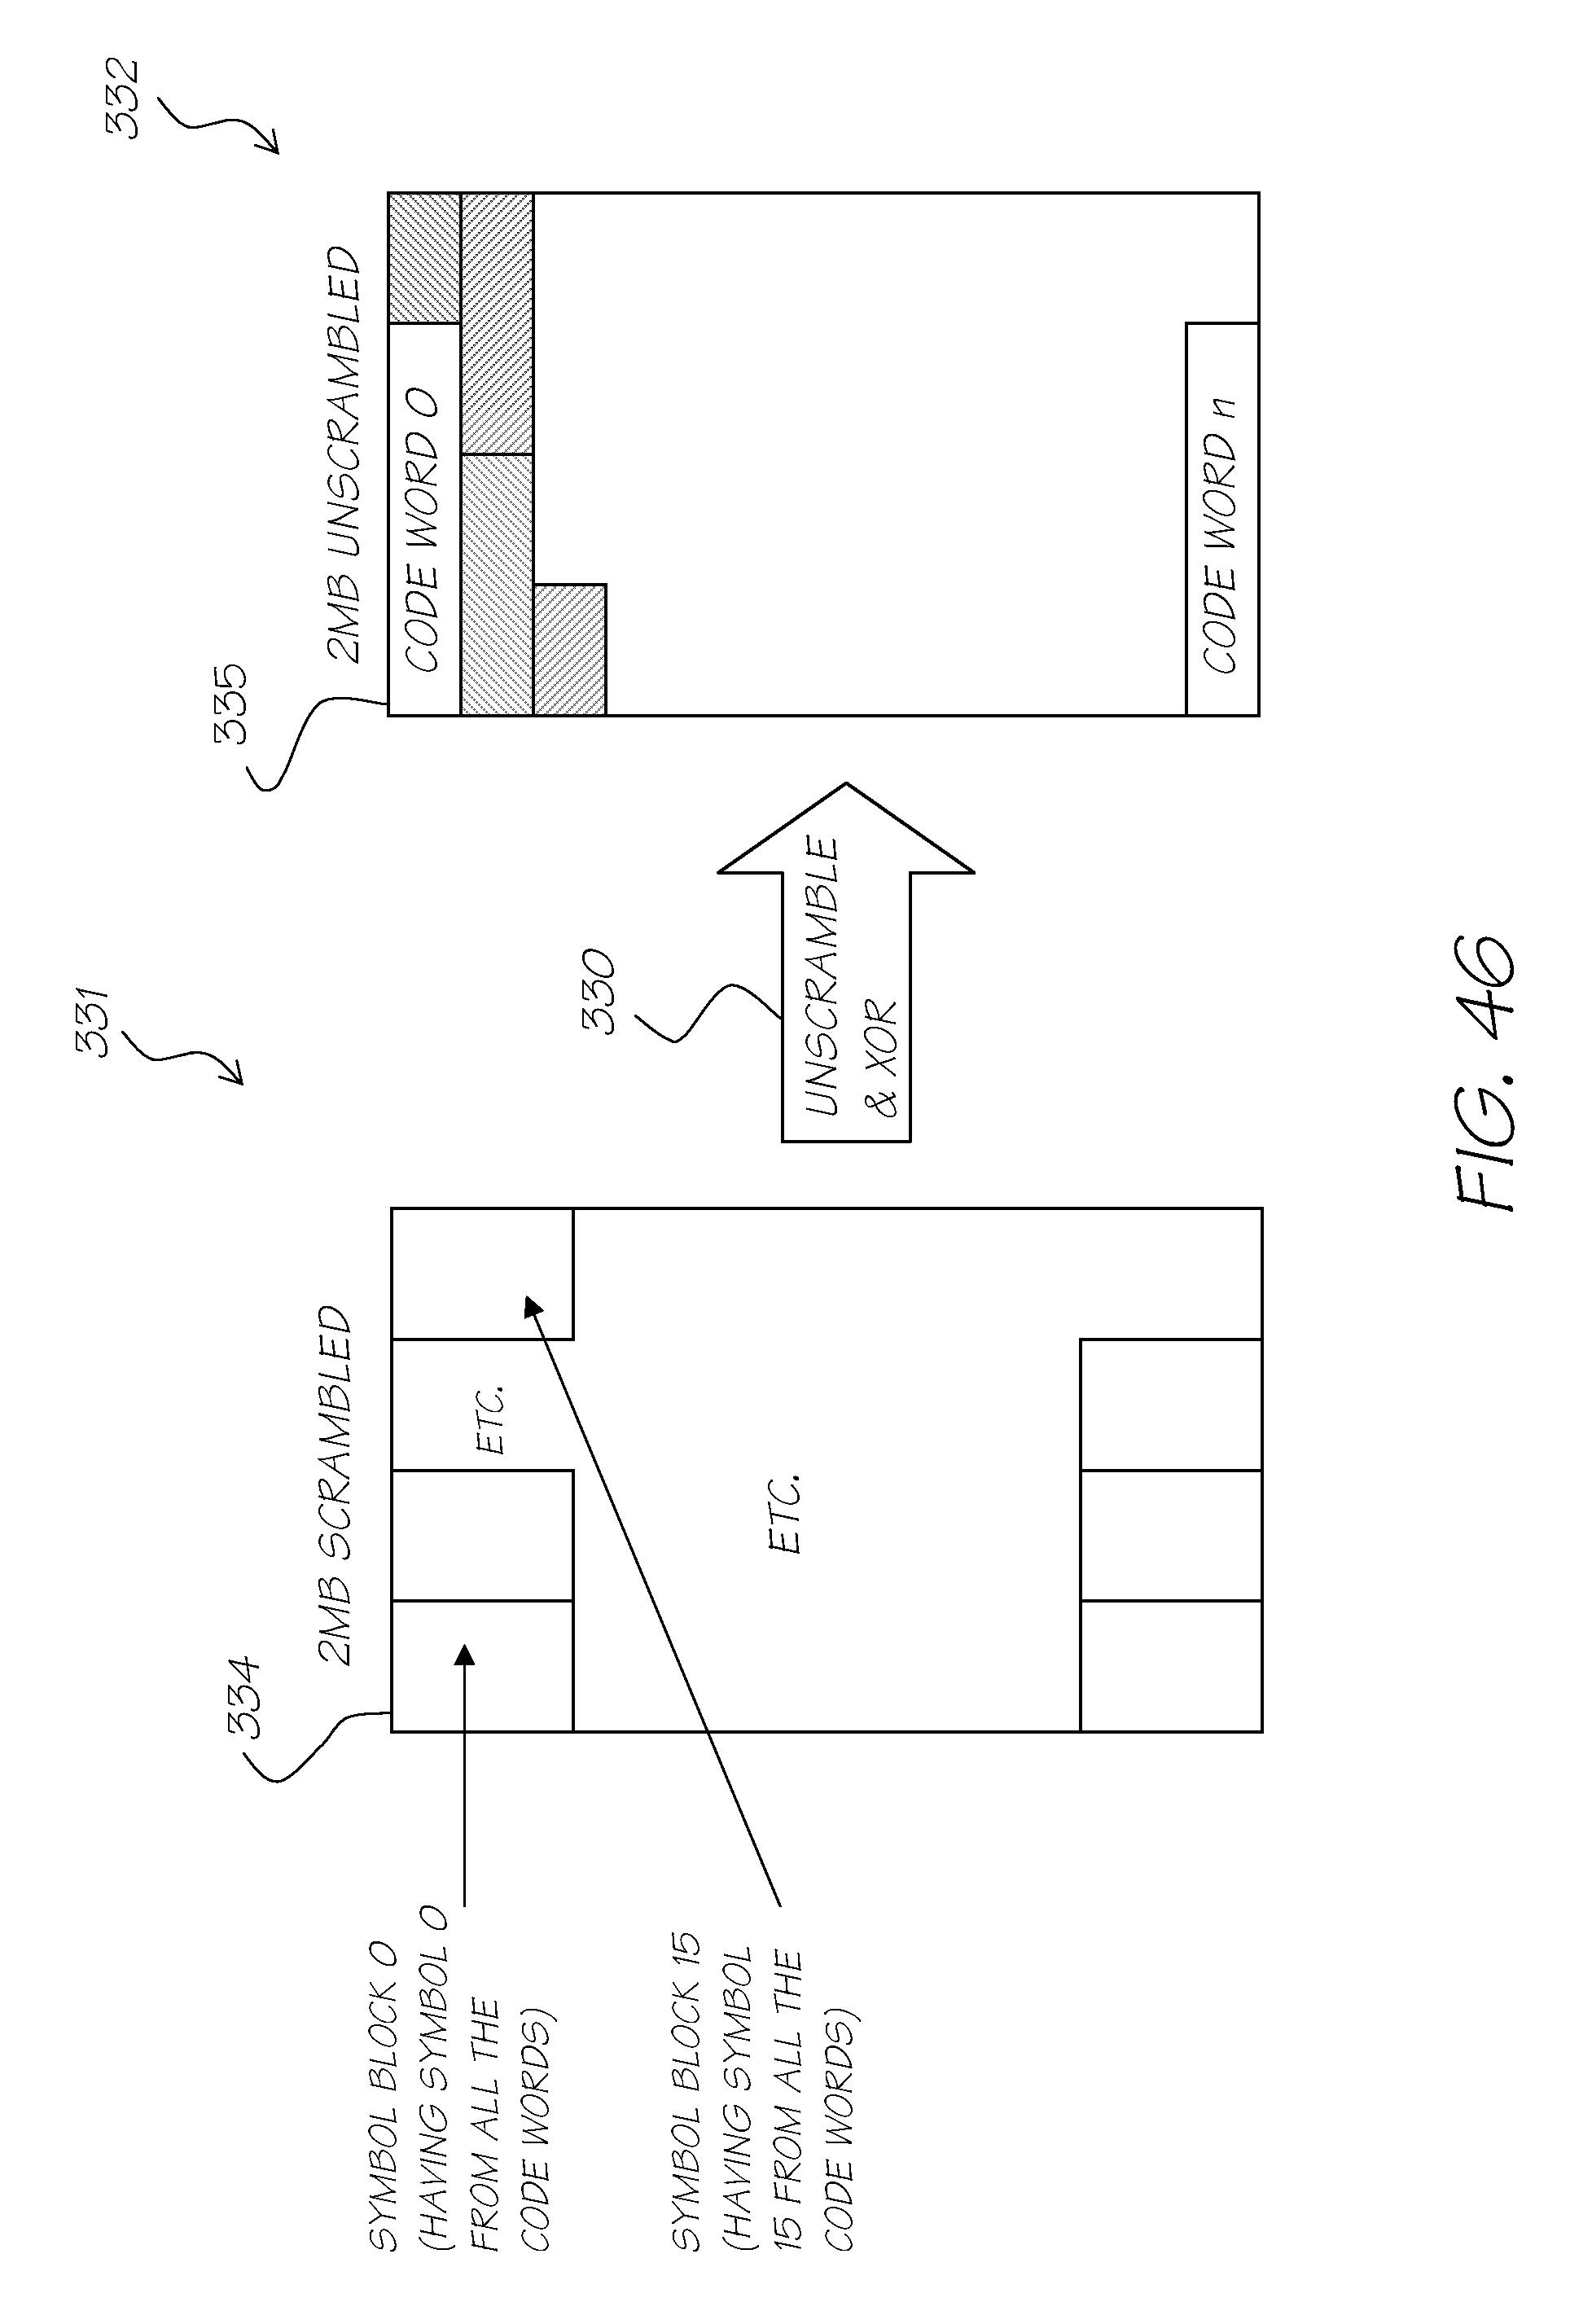 Ac Wiring Diagram 1971 Curl. . Wiring Diagram on